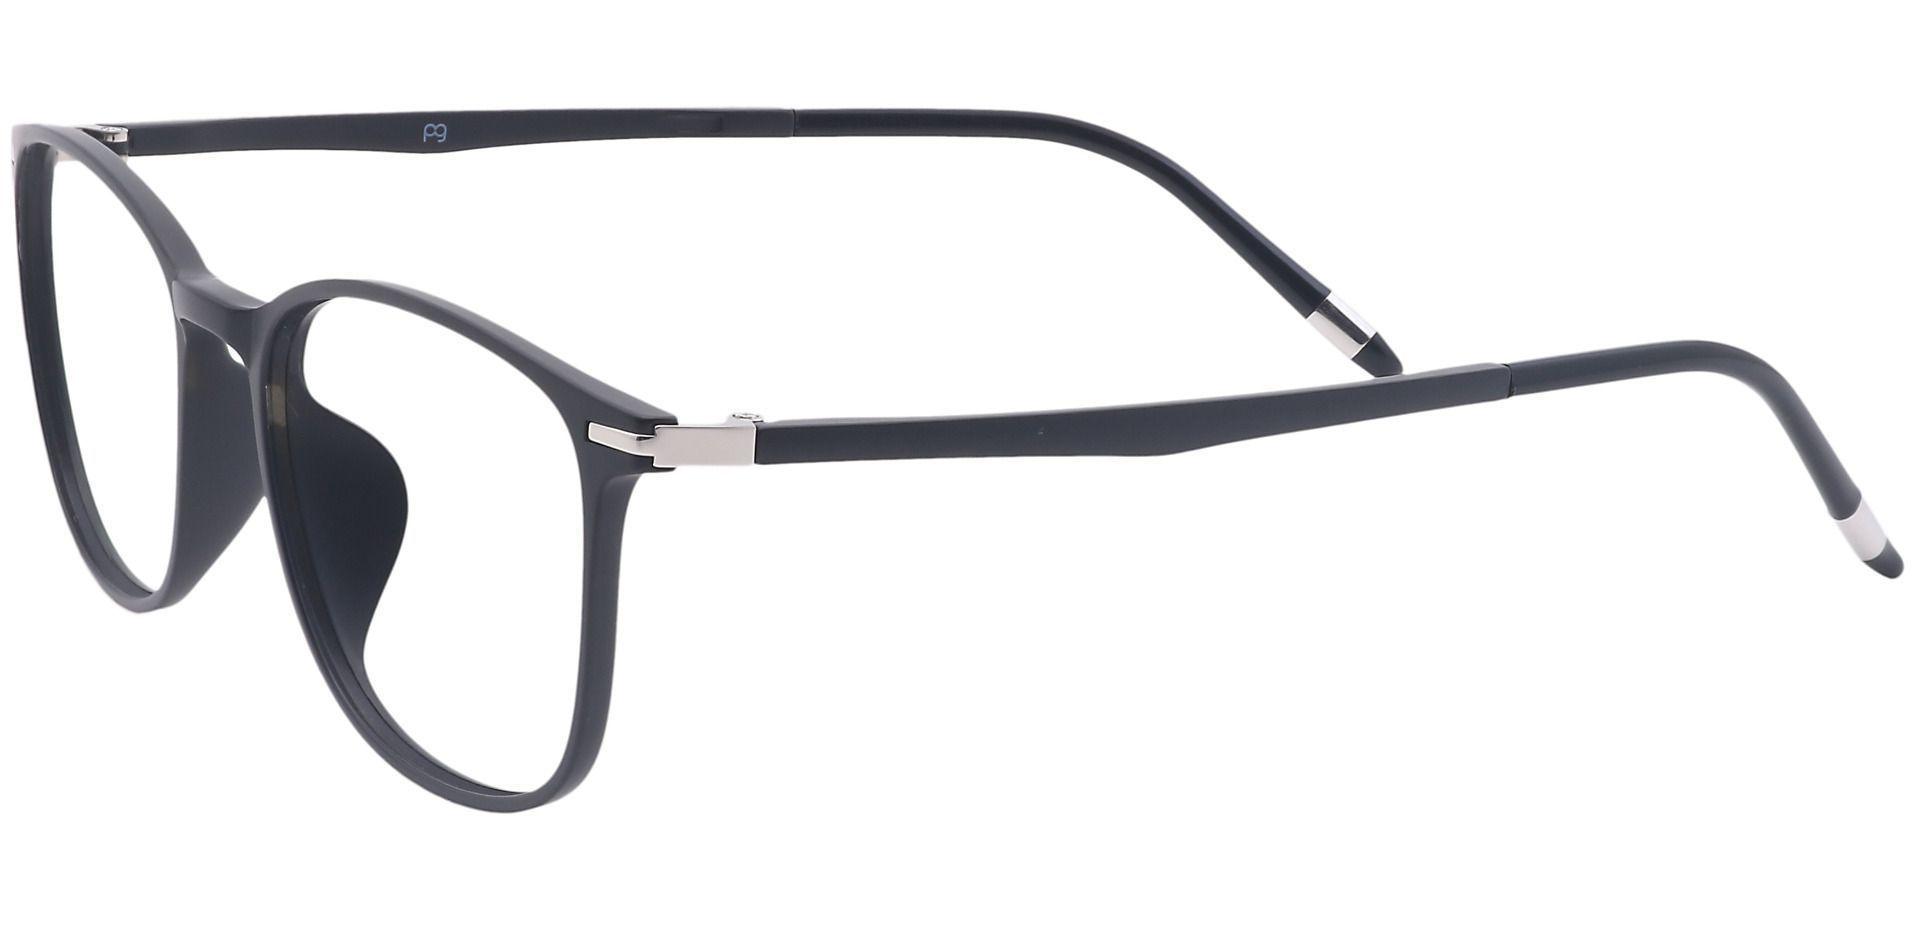 Allison Oval Prescription Glasses - Black